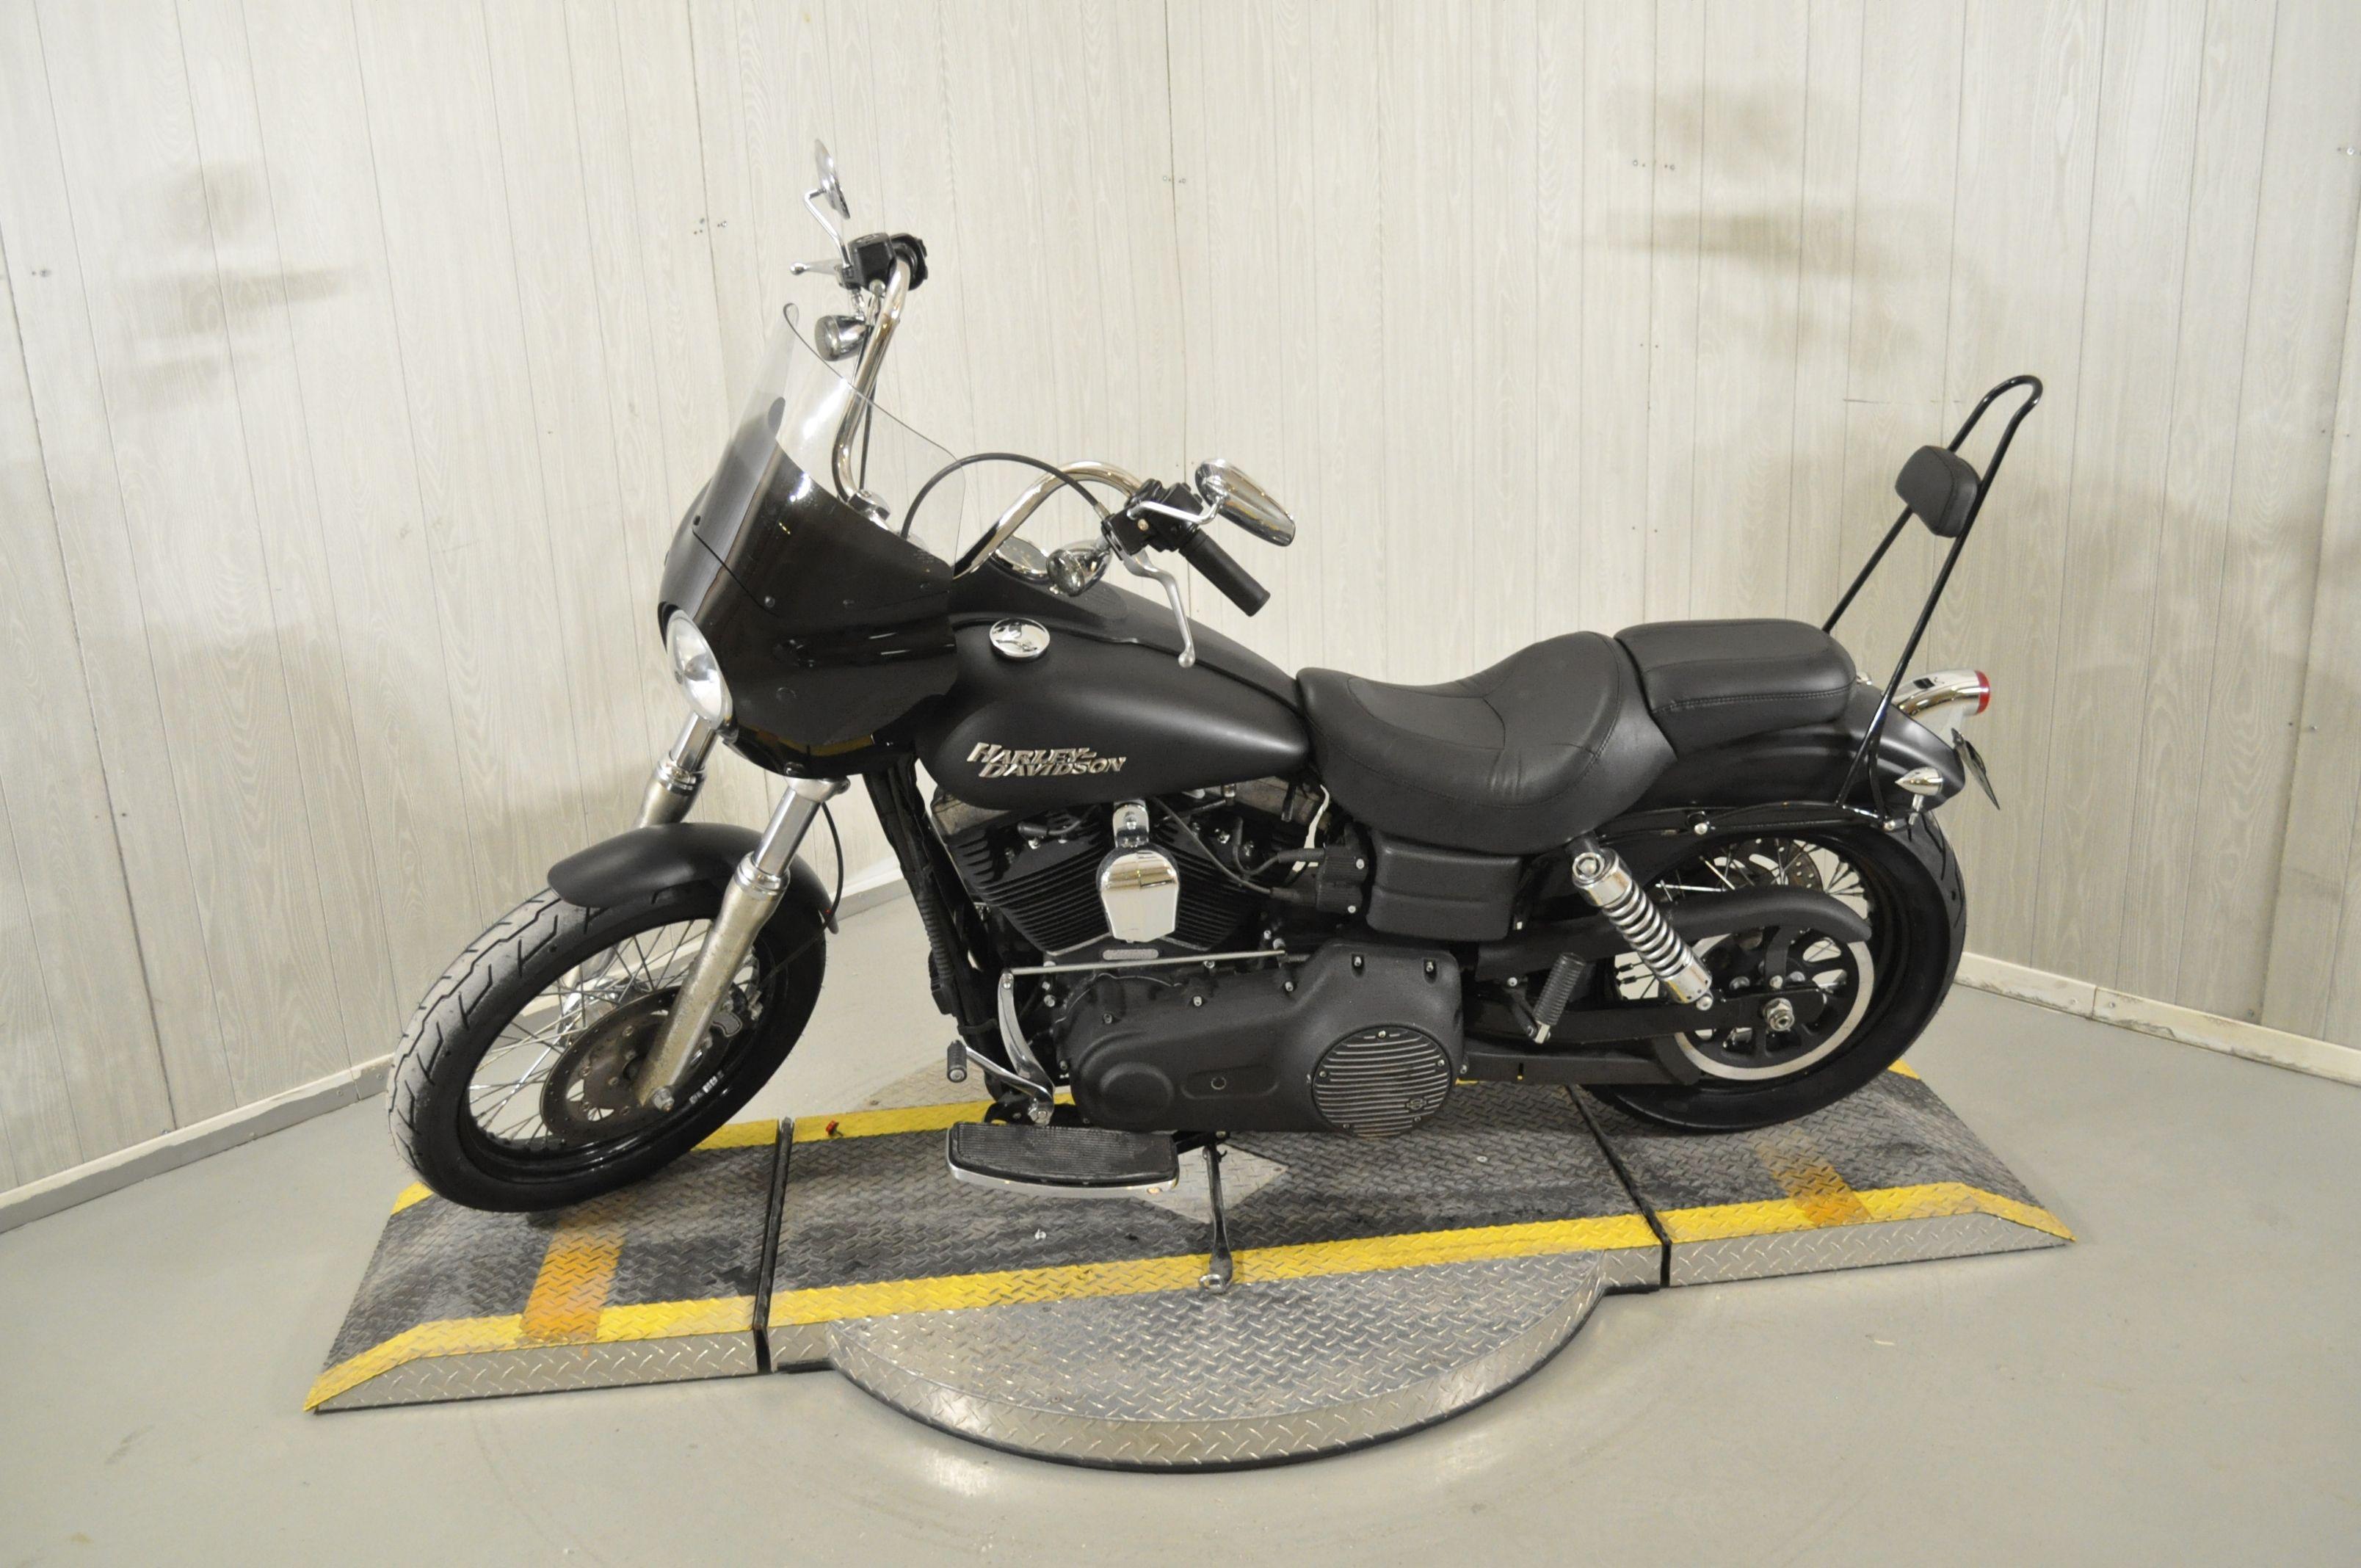 Pre-Owned 2012 Harley-Davidson Street Bob FXDB